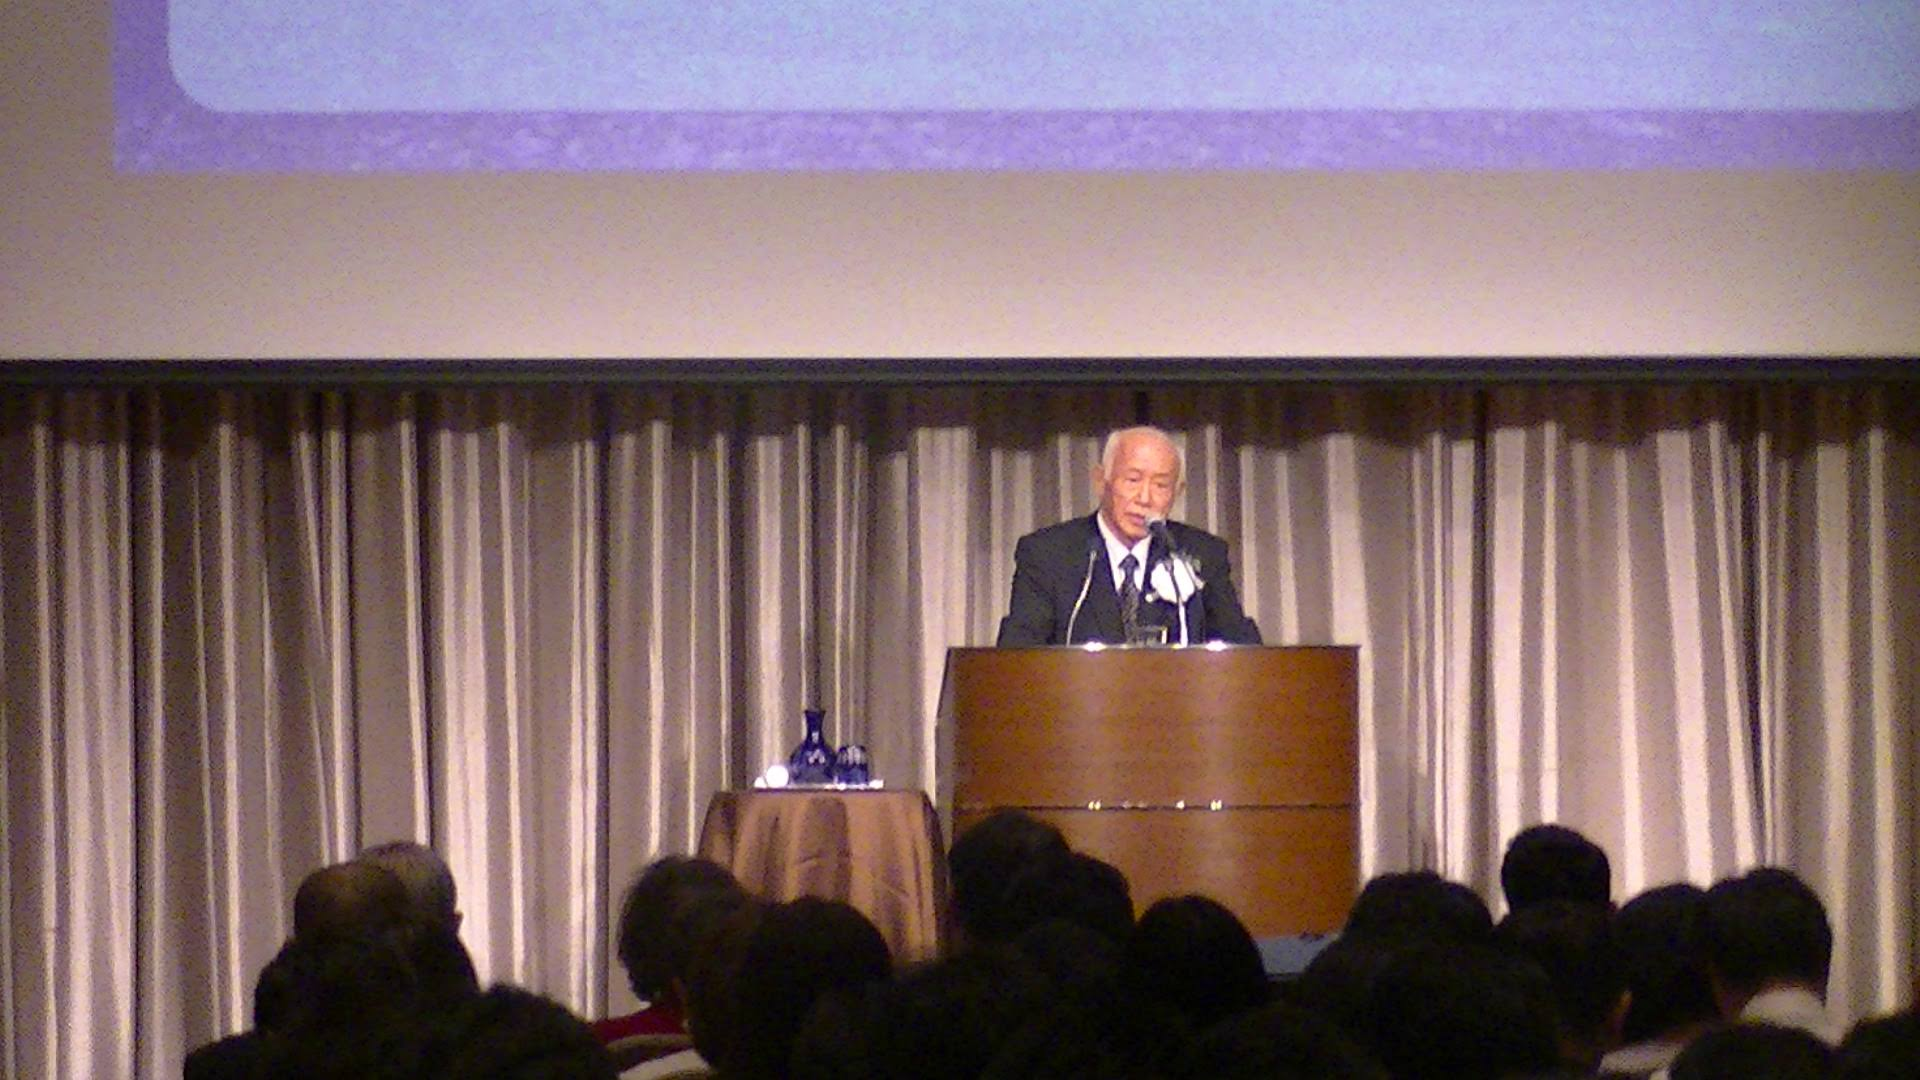 PIC 1654 1 - 思風会全国大会in広島